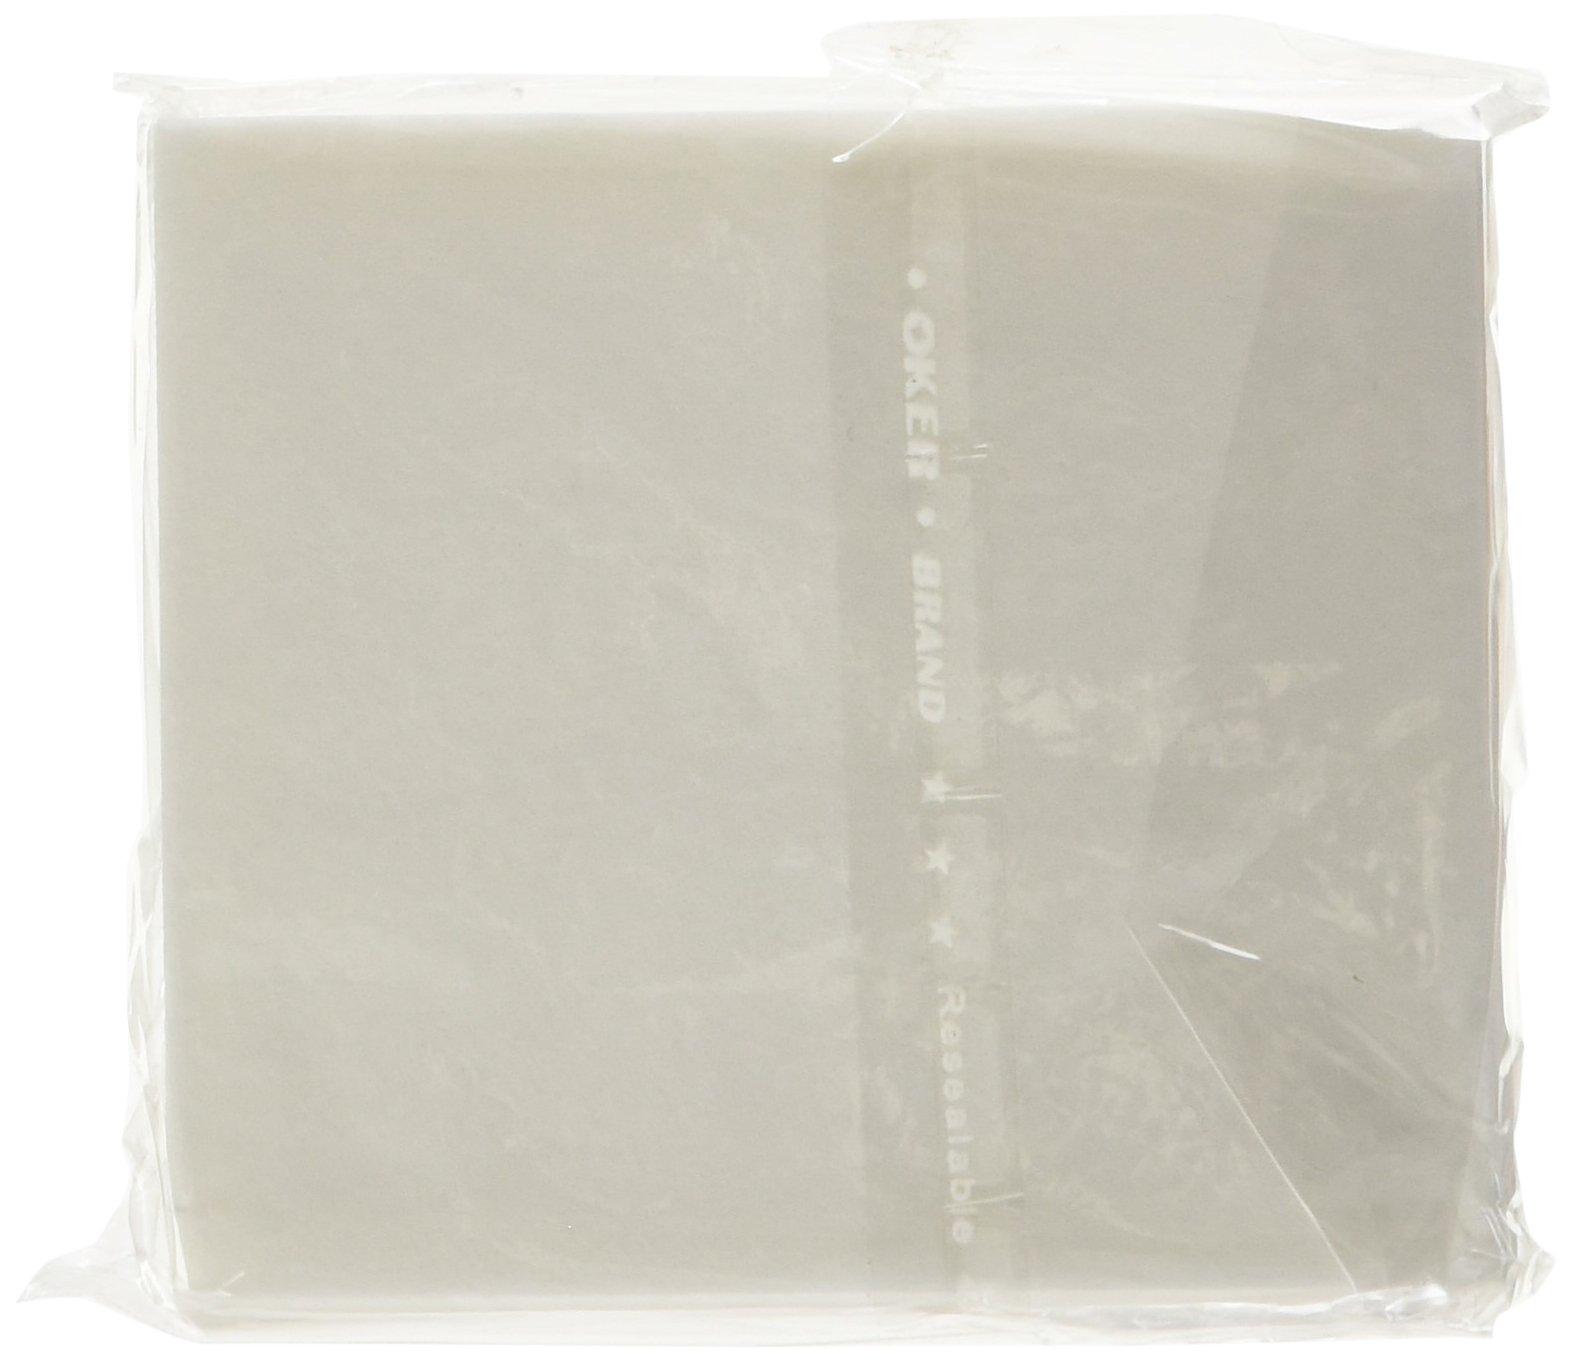 Special Tea Empty Tea Bags Bulk Case, 2.5 x 2.75 Inches, 5000 Count